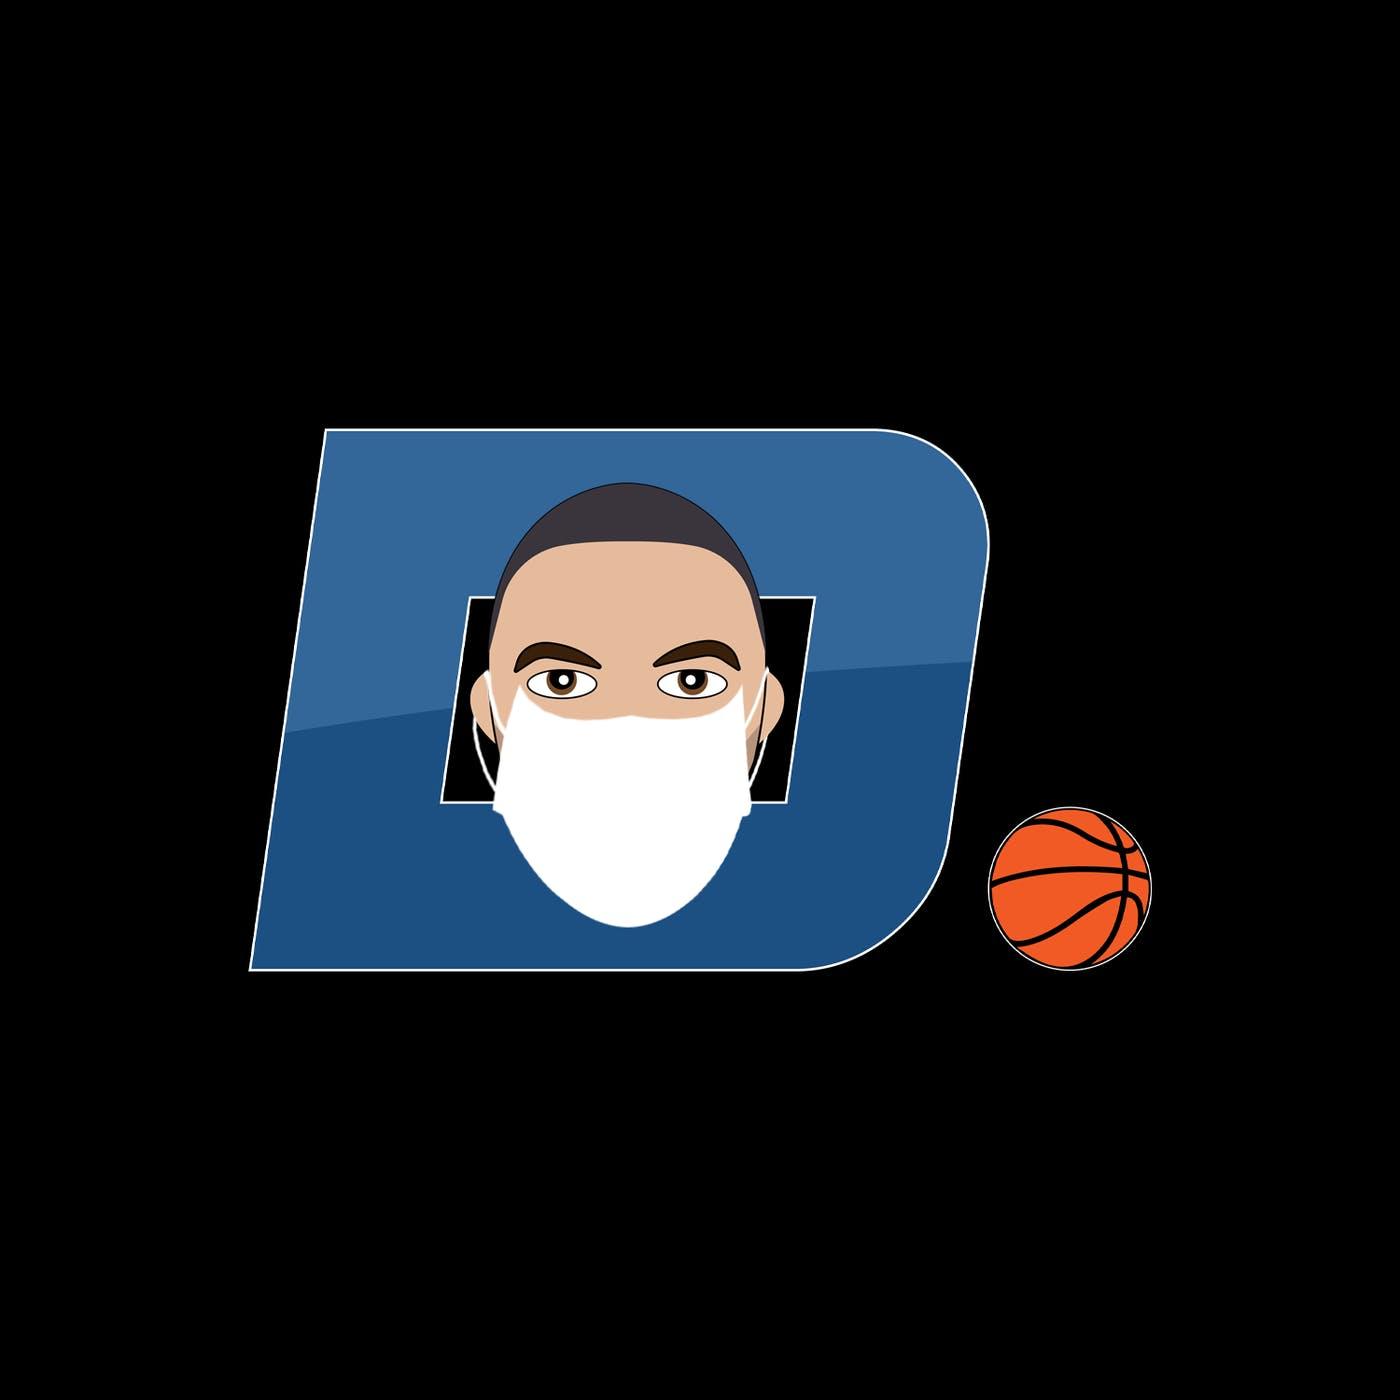 Ep 99 | Team Dime vs. Team Even Odds (w/ Paul Williams & Brandon Niles)